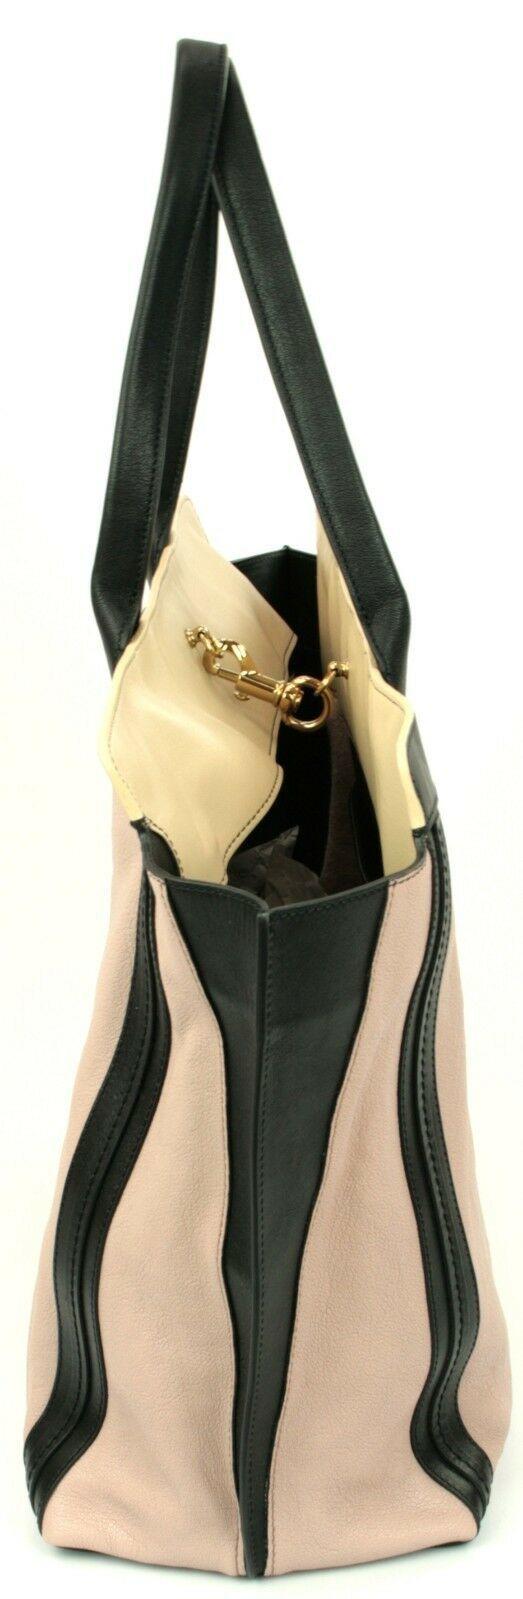 Chloe Alison Tote Bag Leather Tea Petal and Black Medium Handbag RRP £880  image 7